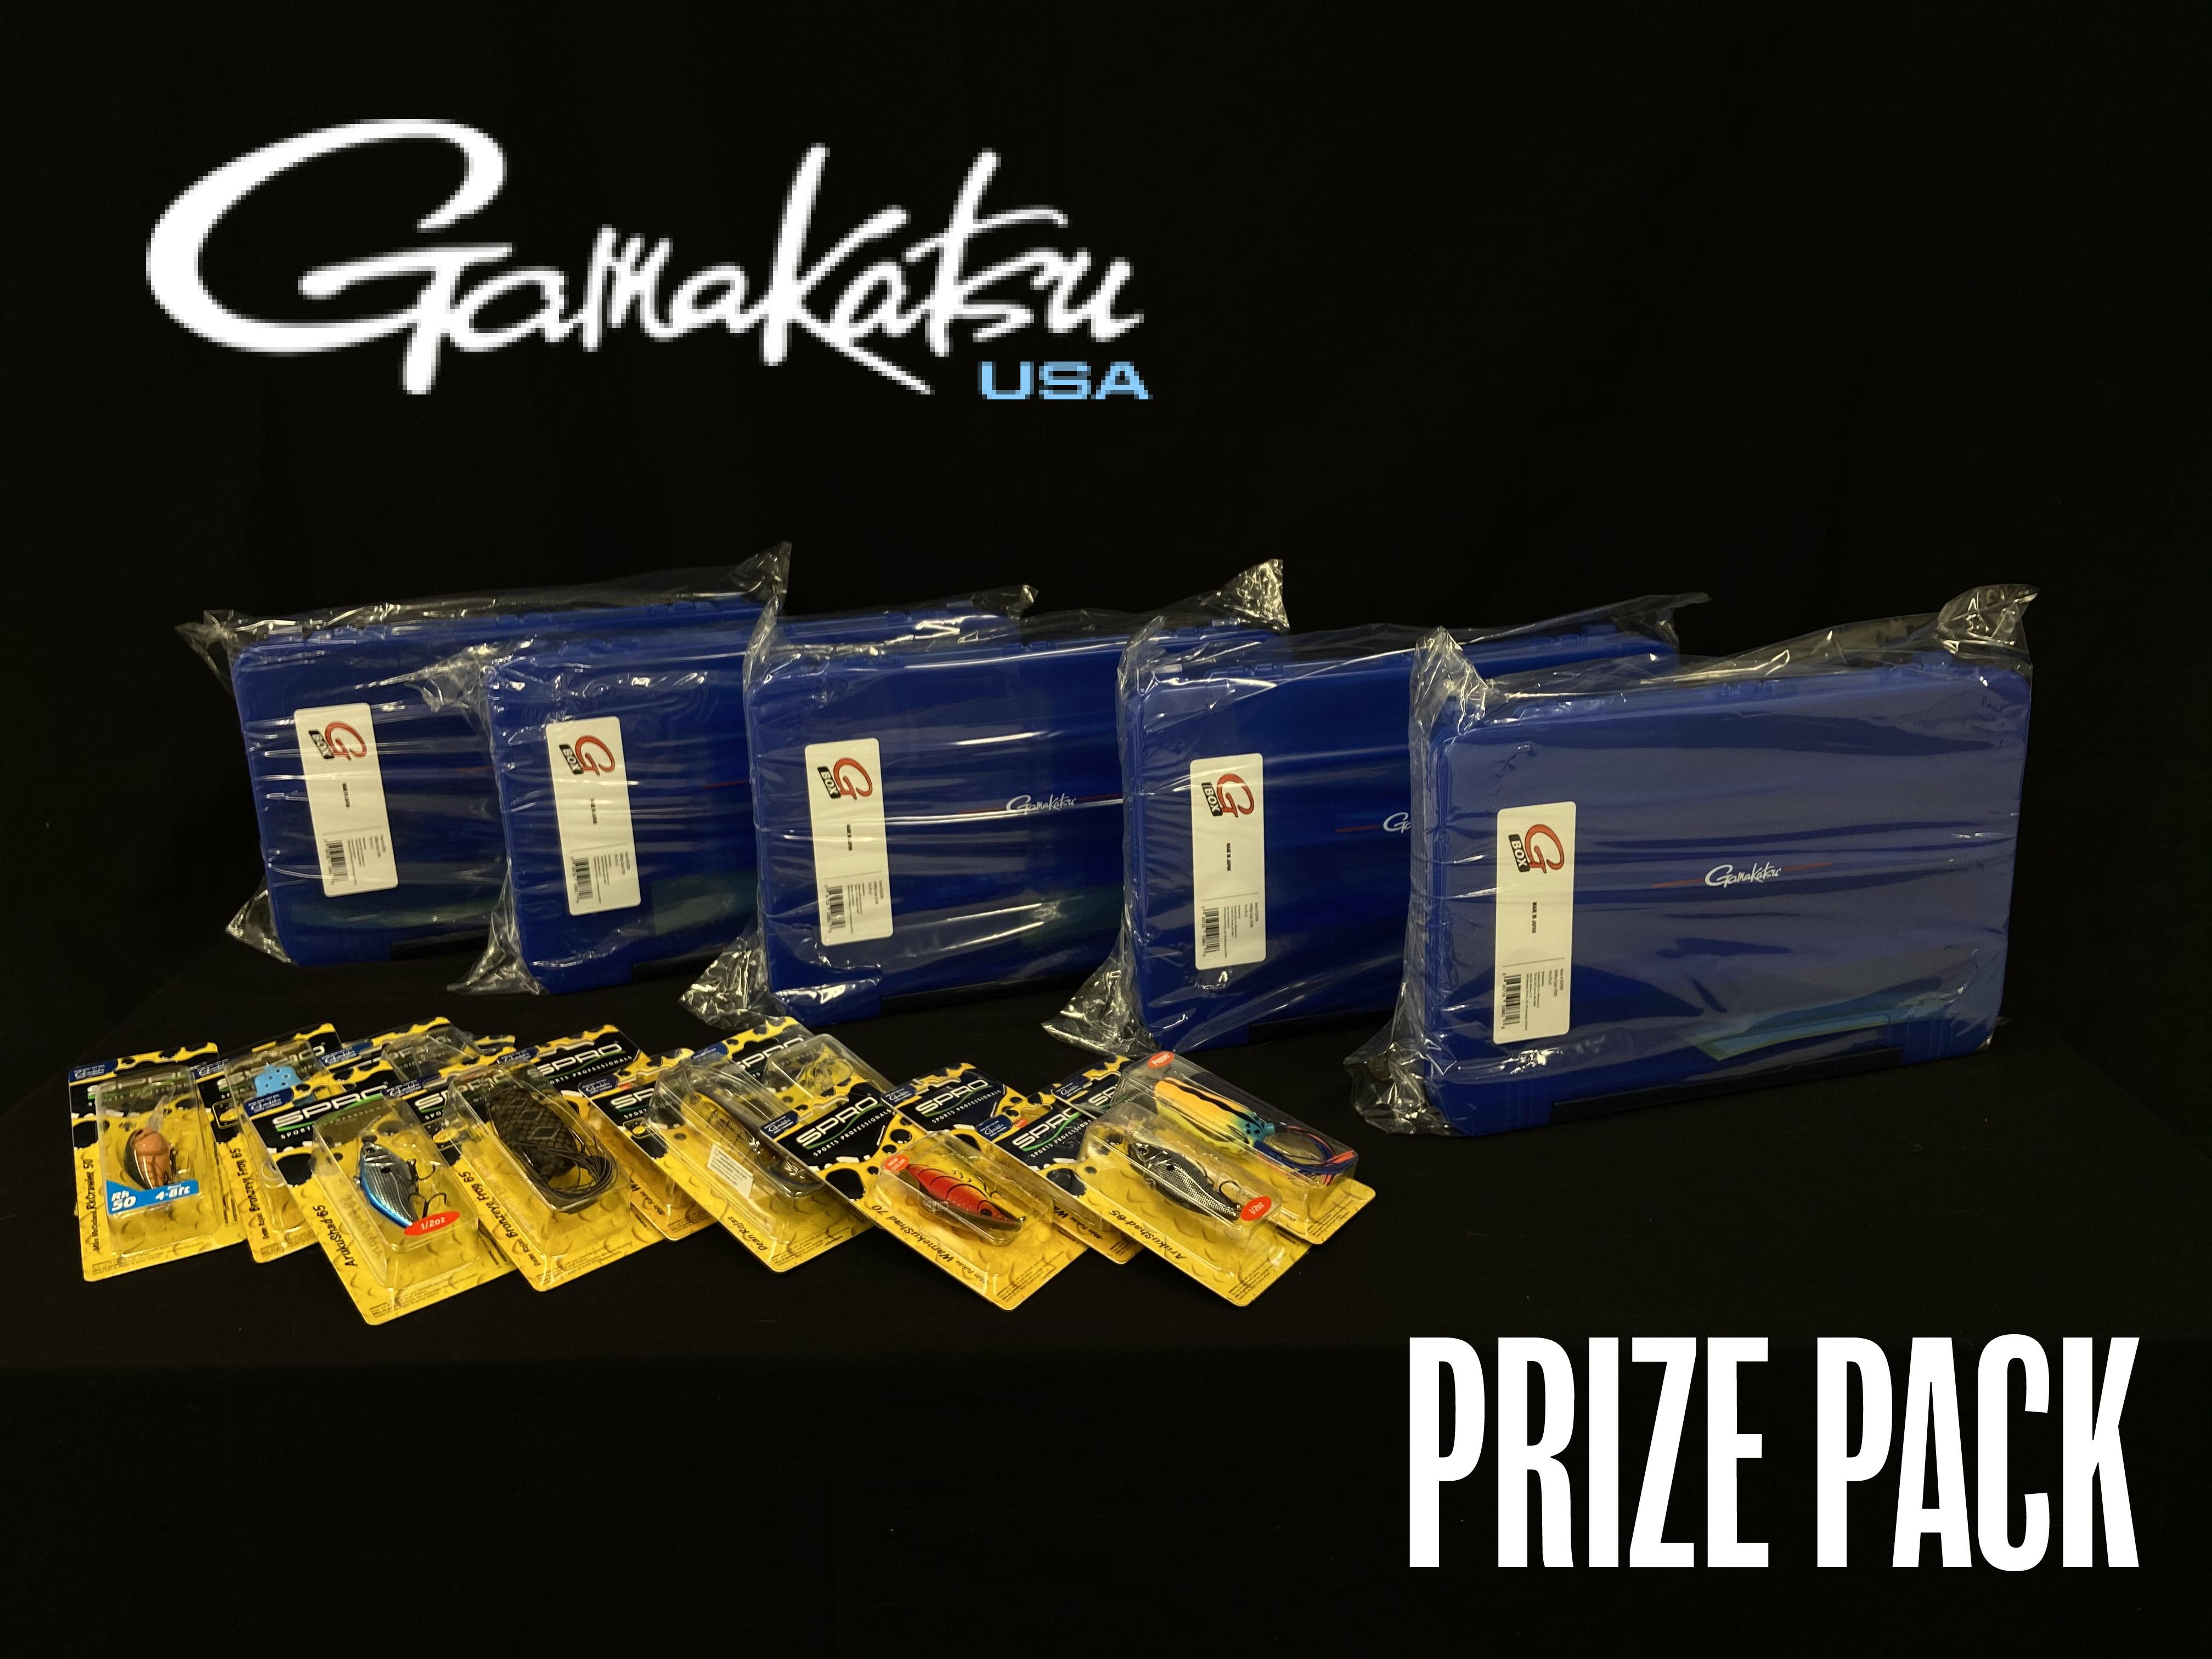 YakAttack 40K Giveaway - SPRO